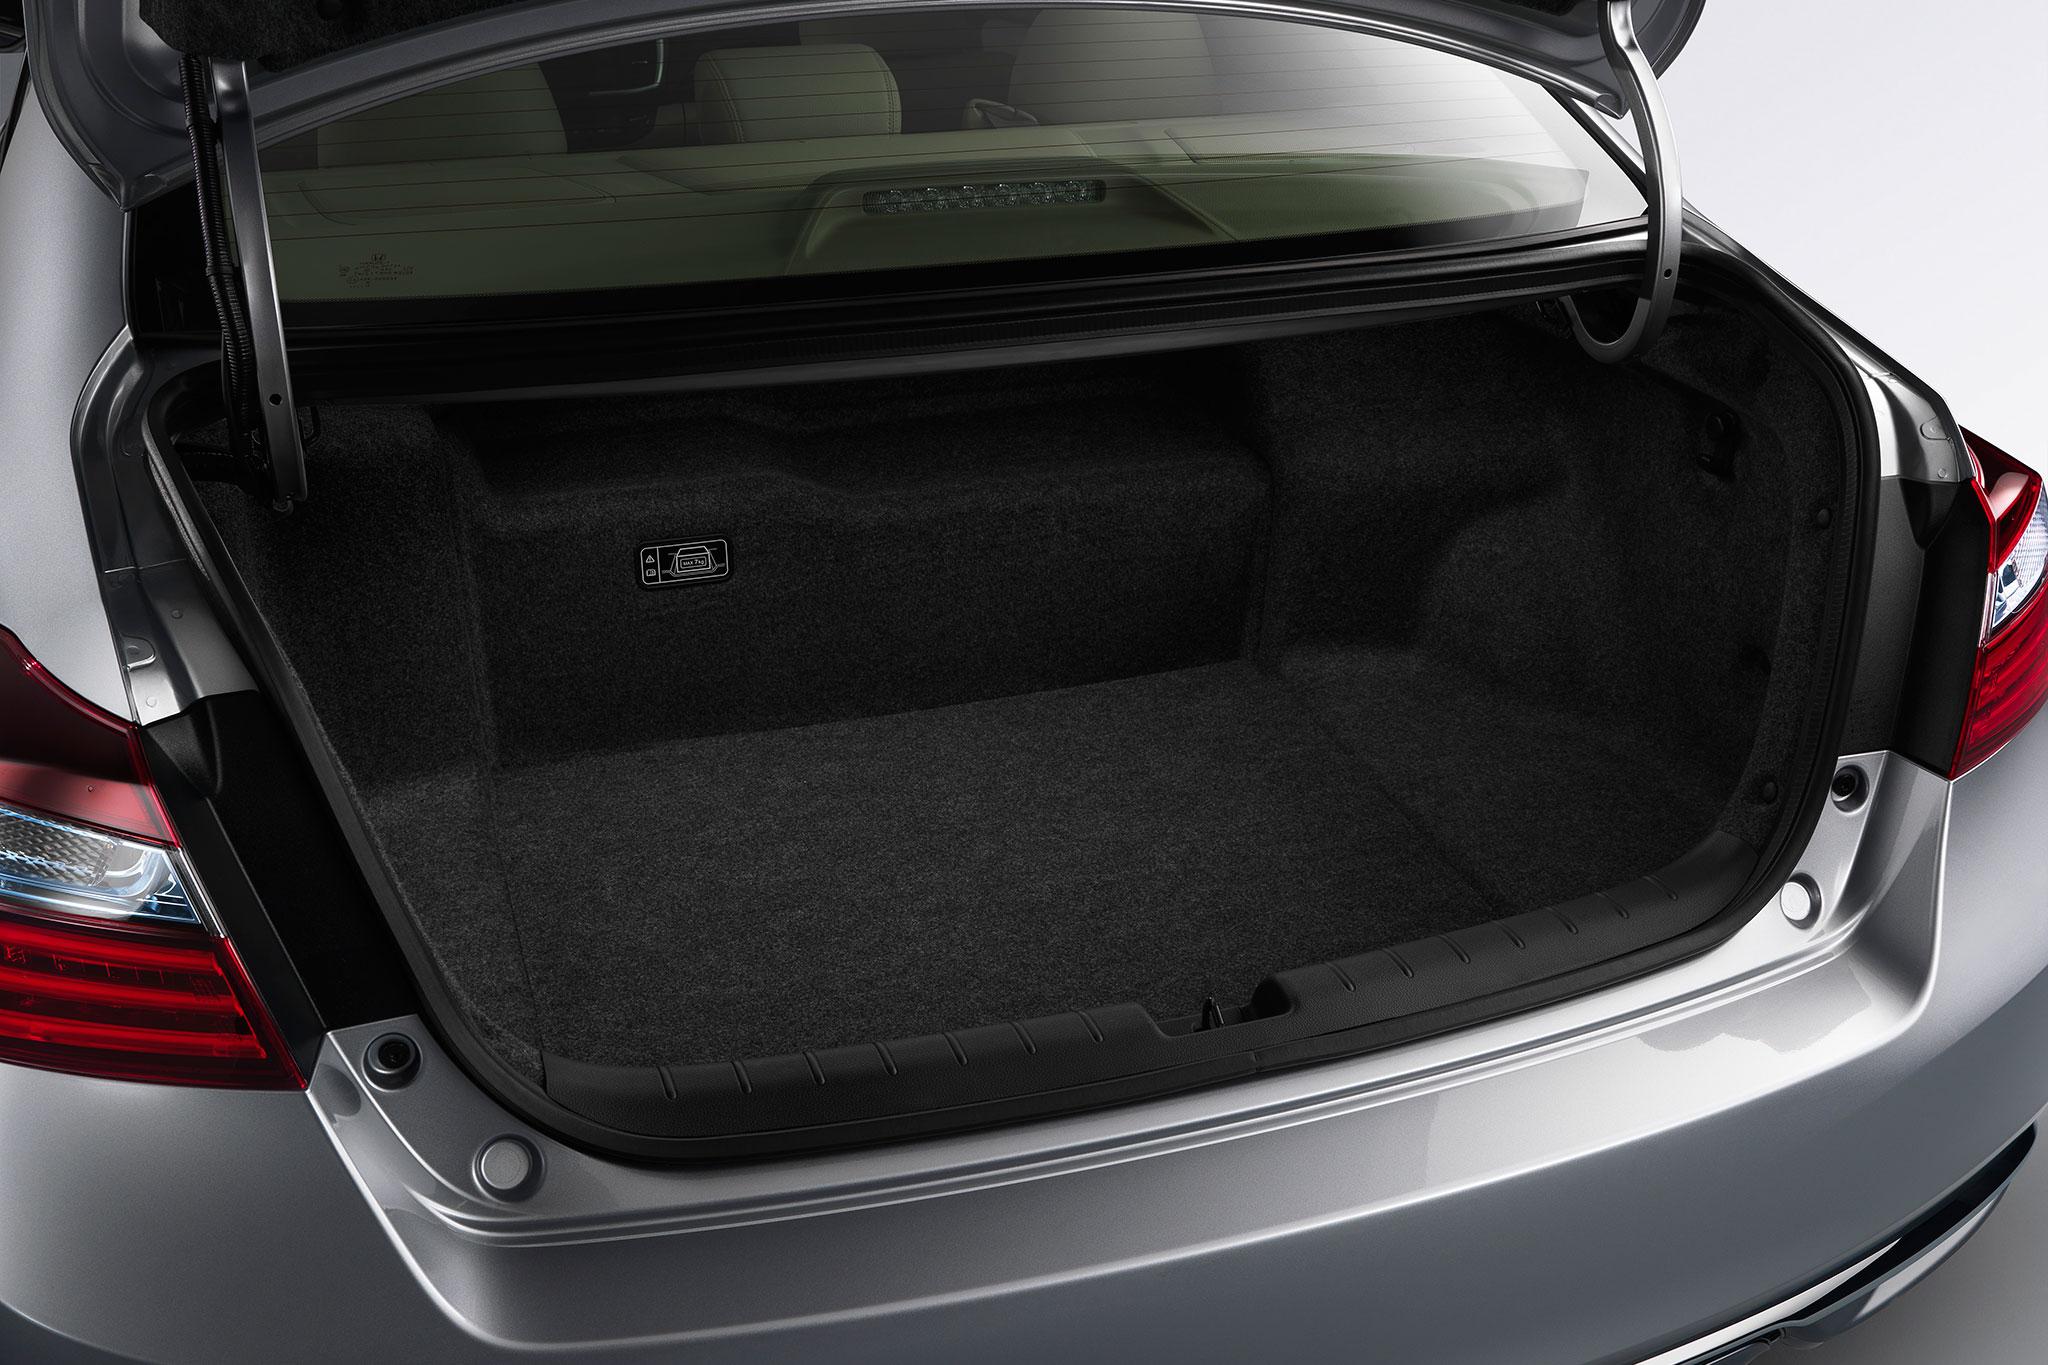 2017 Honda Accord Hybrid Gets More Power, Improved Efficiency   Automobile Magazine